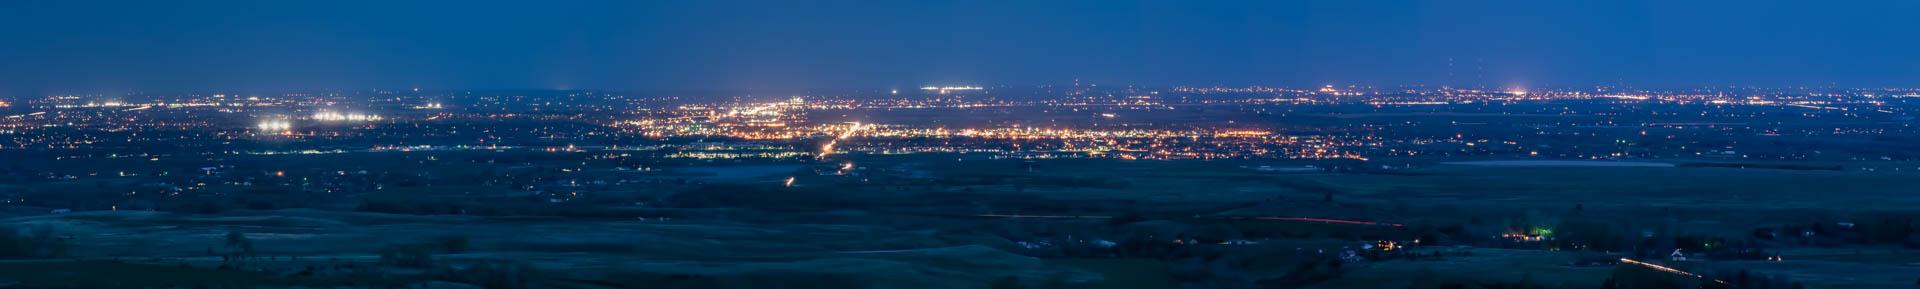 0824 Longmont Plains NS Panorama0 Edit E 1920 - Evening Photos